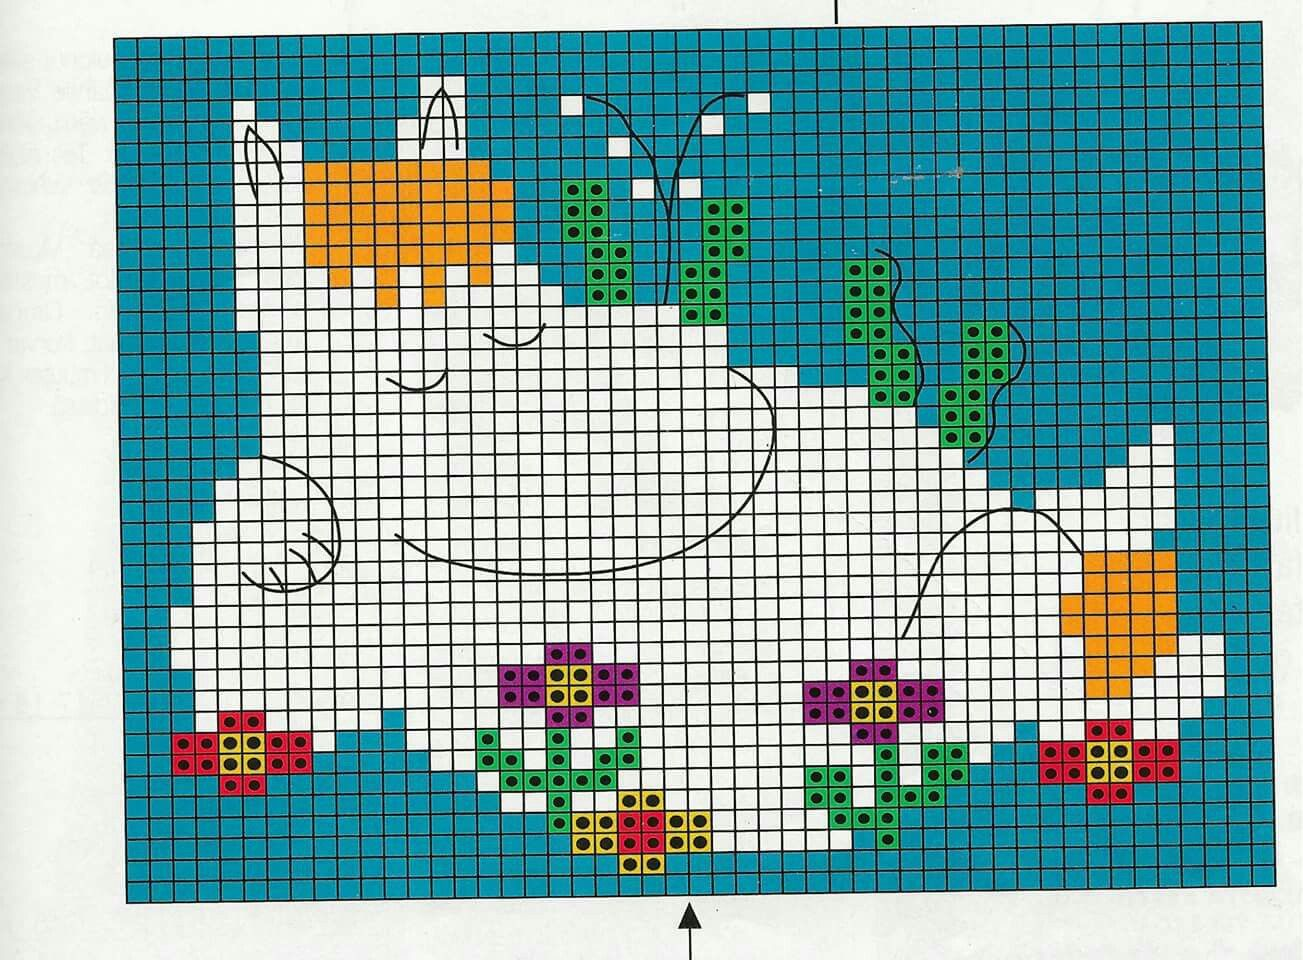 Afbeeldingsresultaat voor moomin knitting pattern   mallit ...